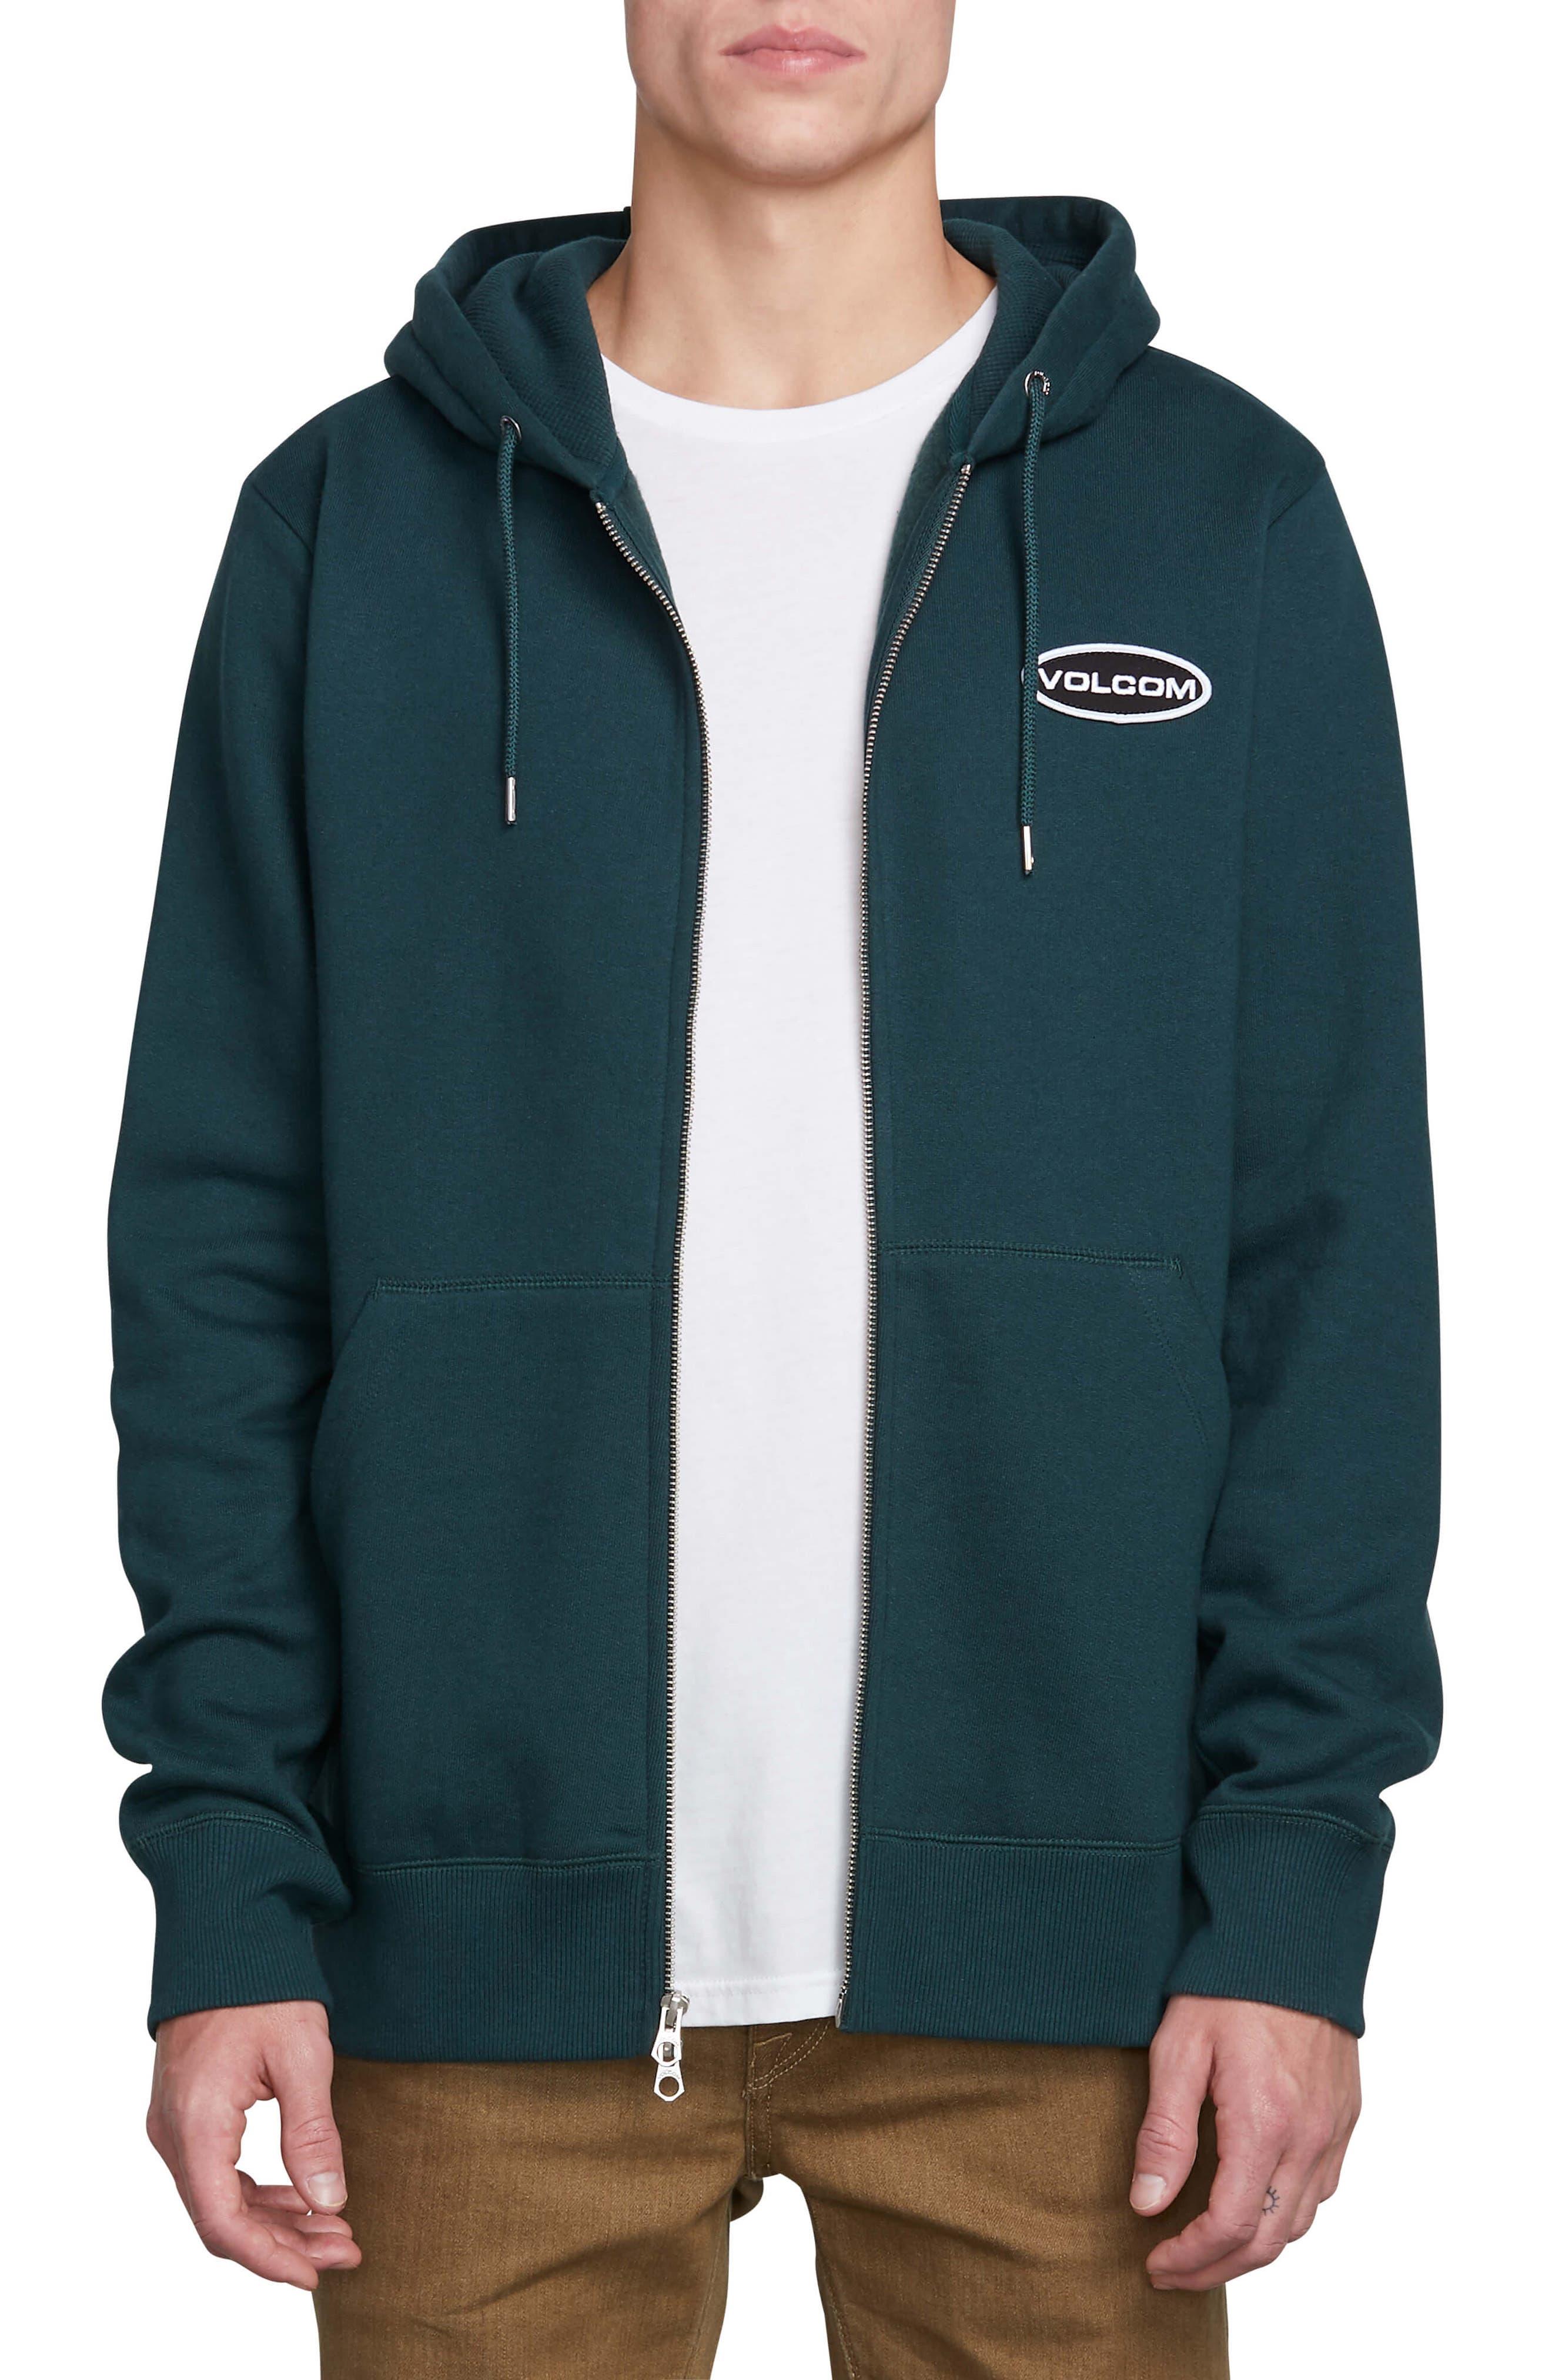 VOLCOM Shop Zip Hoodie Jacket, Main, color, DARK PINE